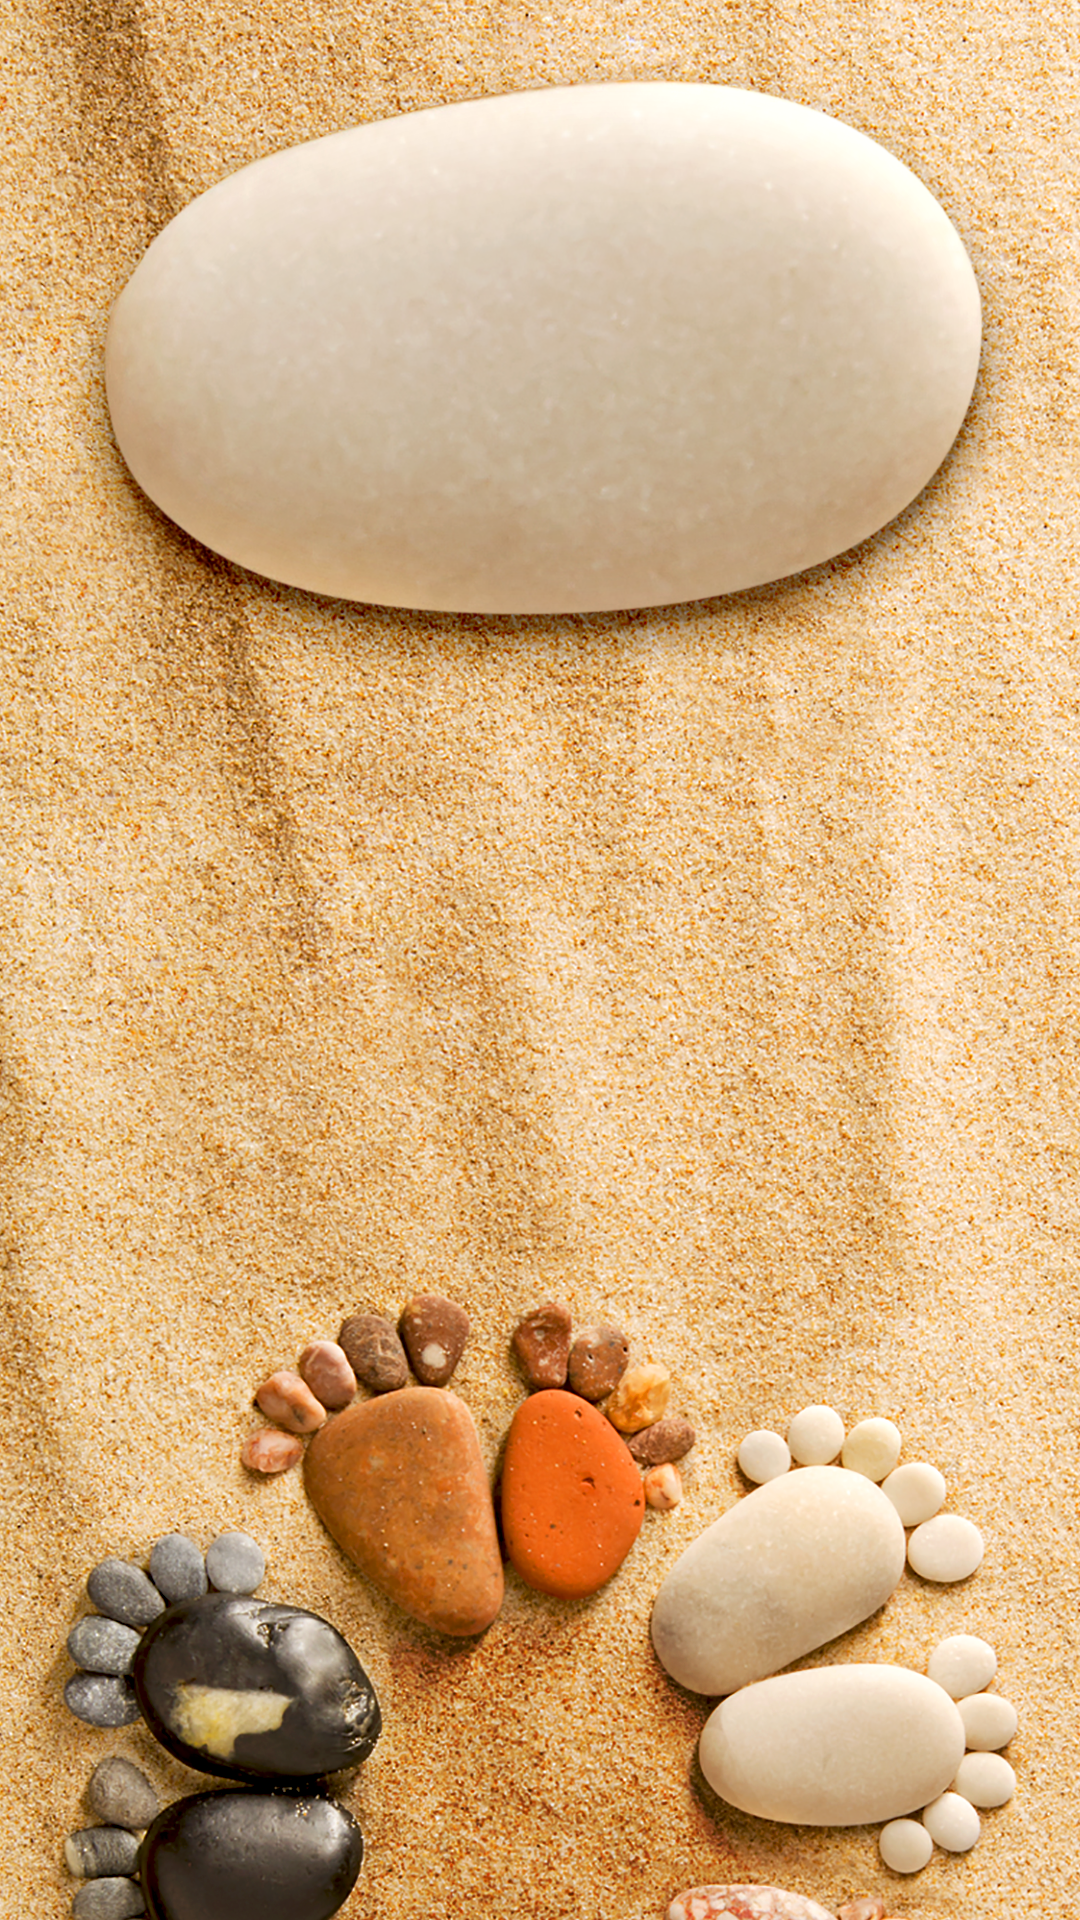 ↑↑TAP AND GET THE FREE APP Lockscreens Art Creative Sand Steps